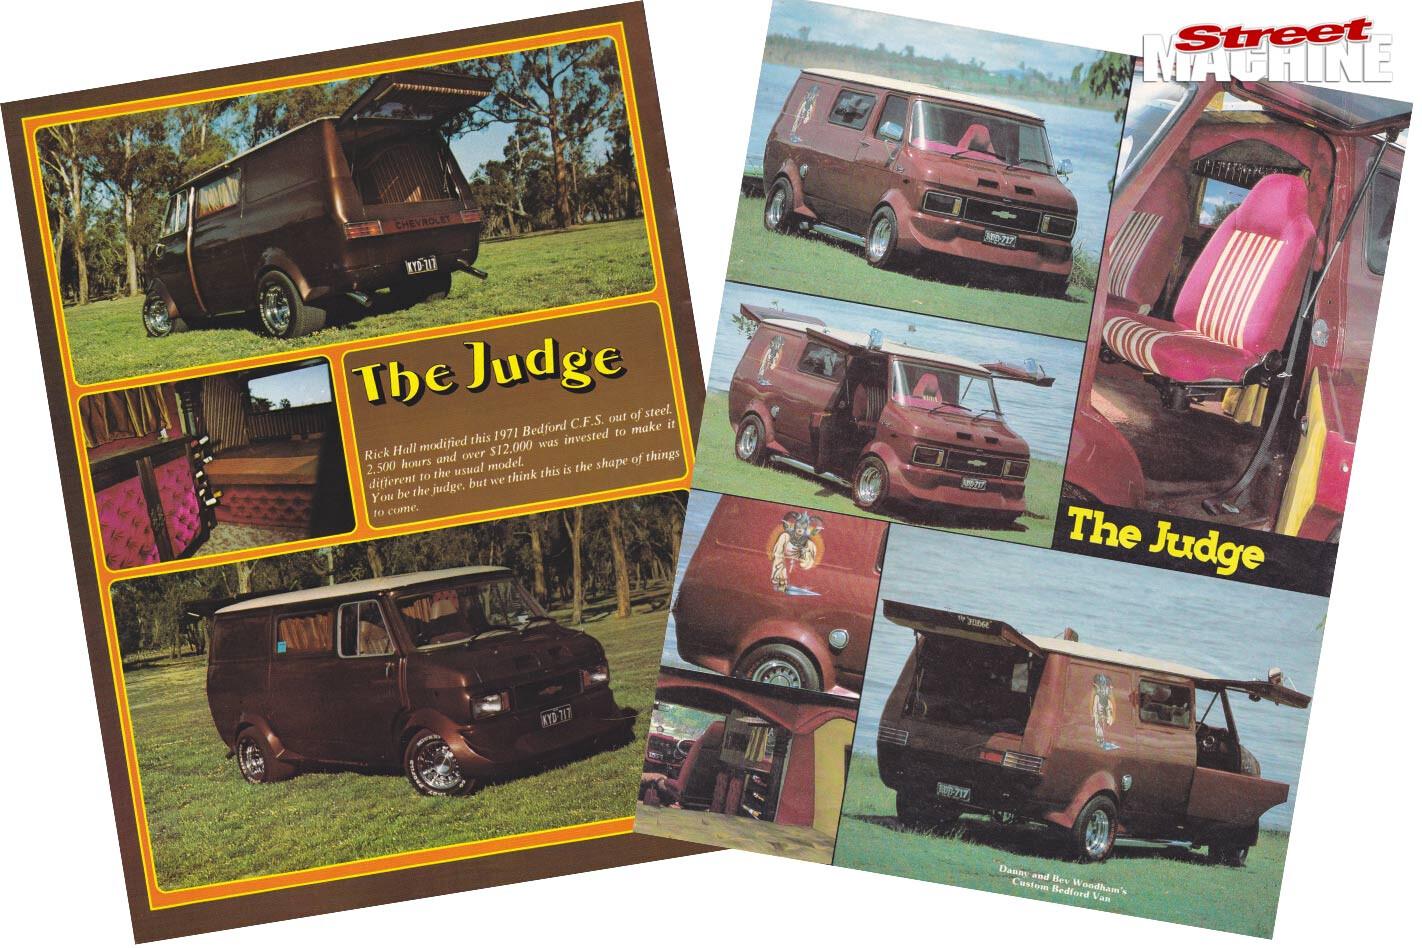 Bedford Van The Judge articles